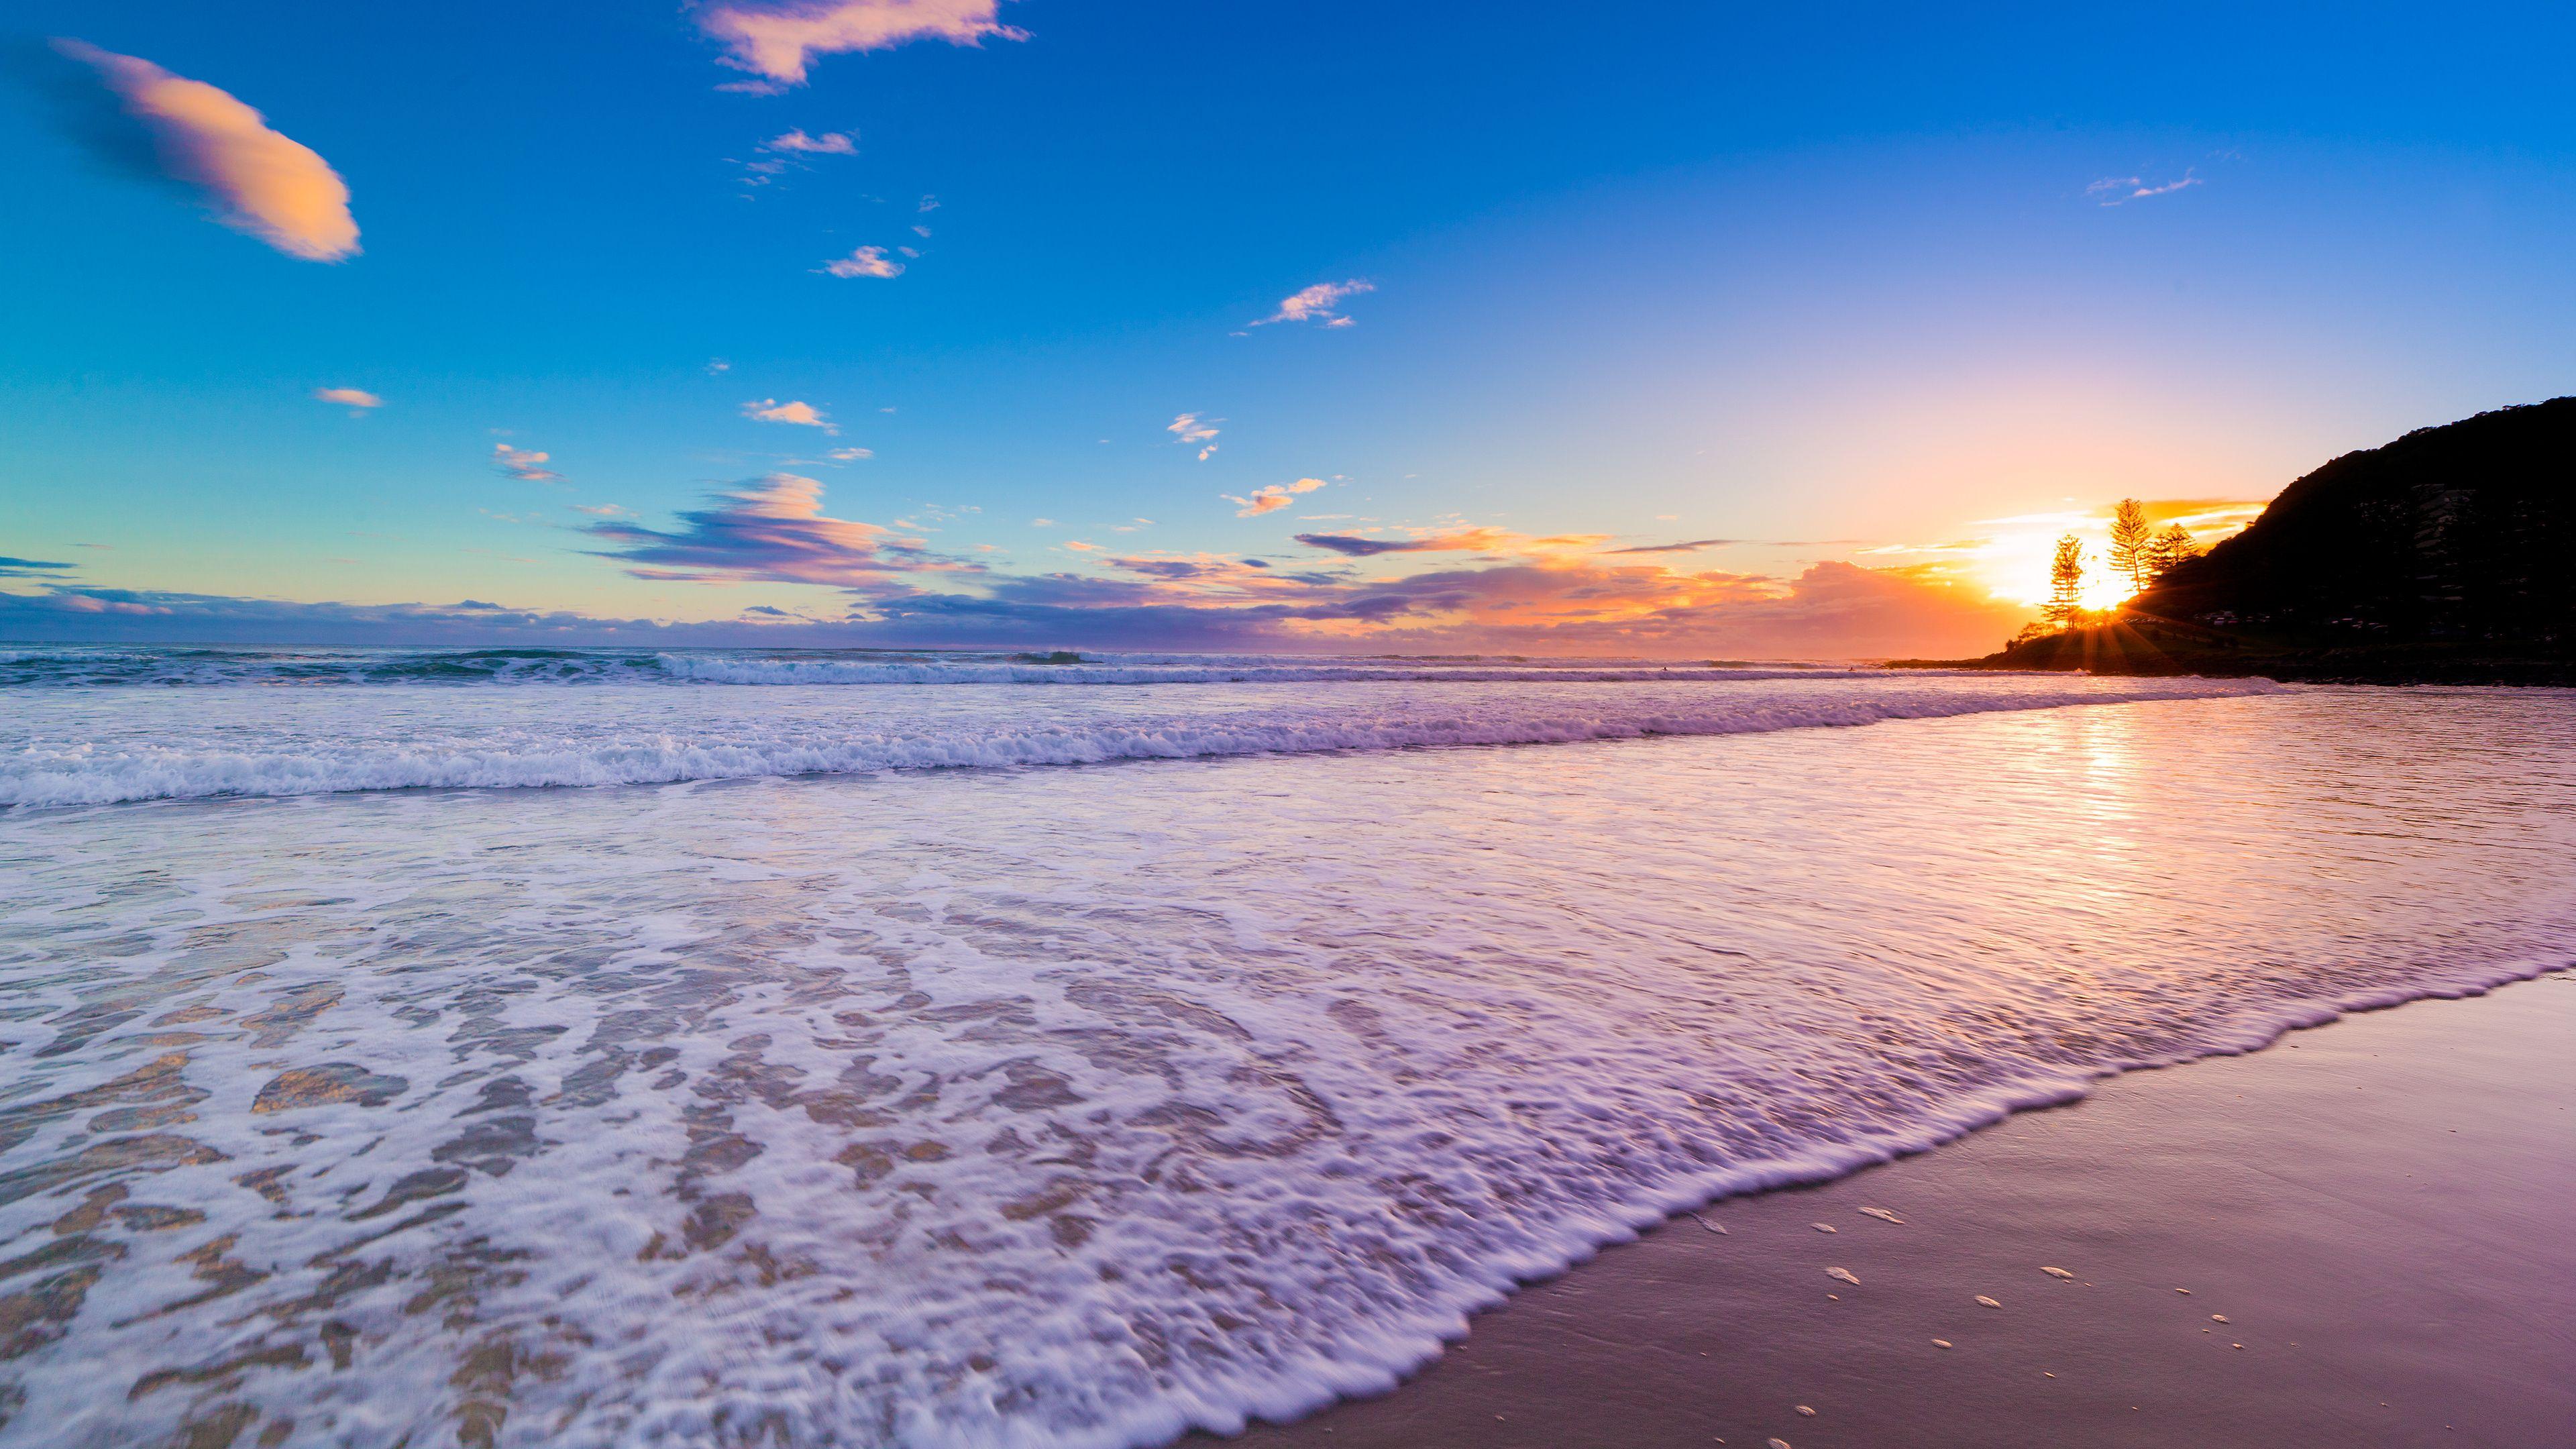 Permalink to Gold Coast Australia Beach Sunset Wallpaper